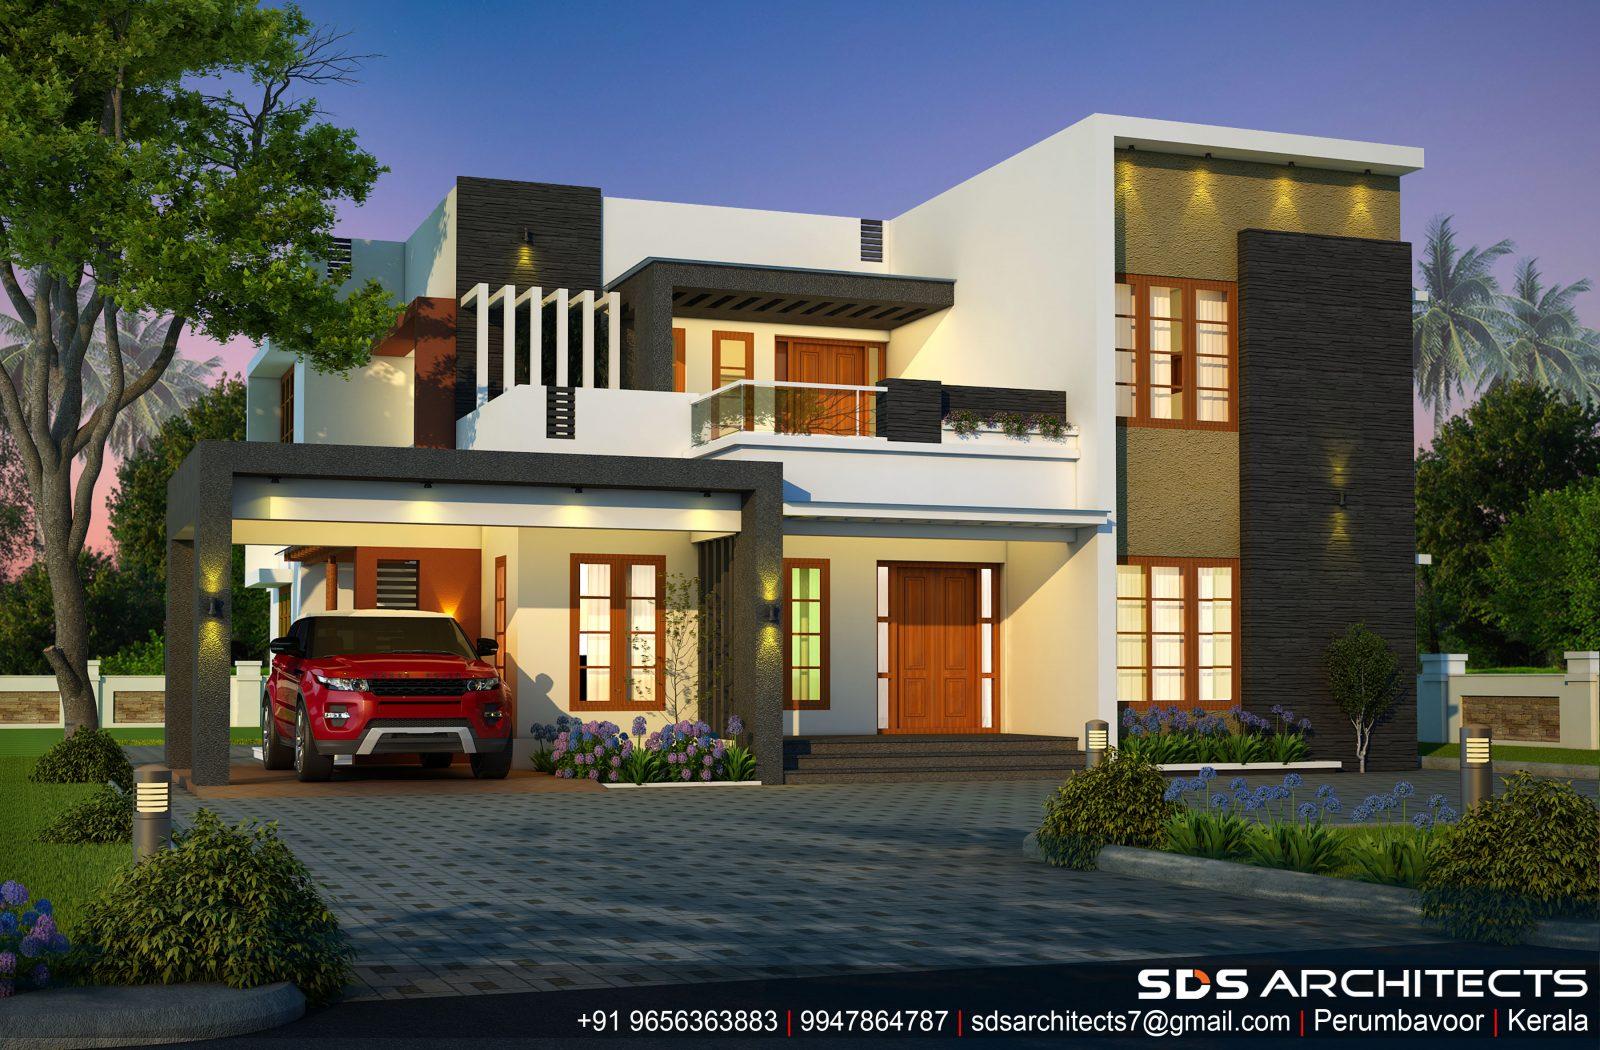 2758 Square Feet Double Floor Contemporary Home Design